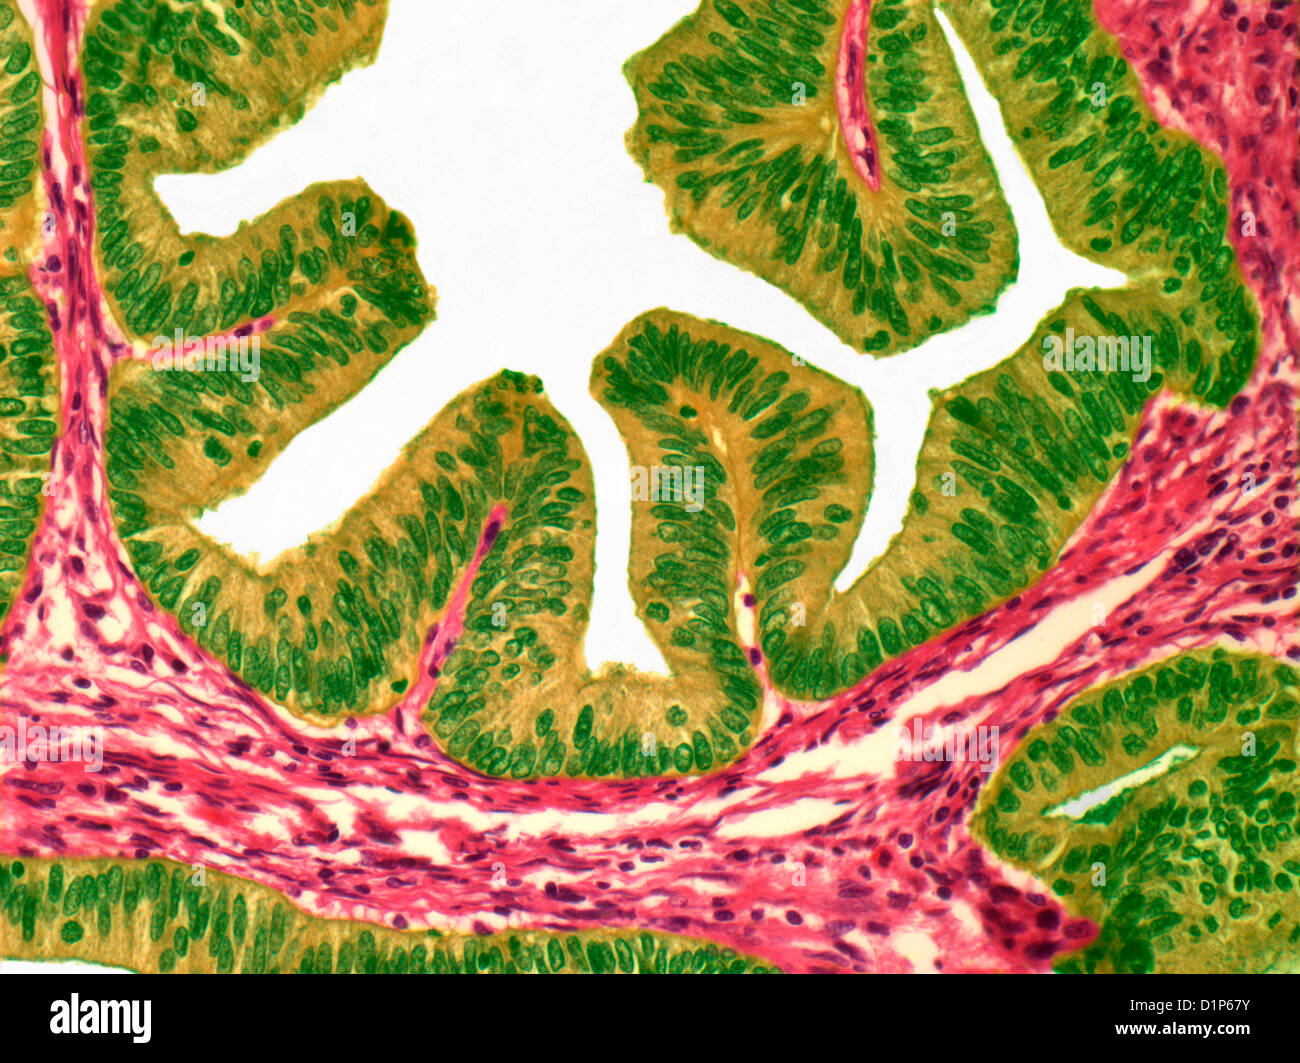 Uterine cancer, light micrograph - Stock Image